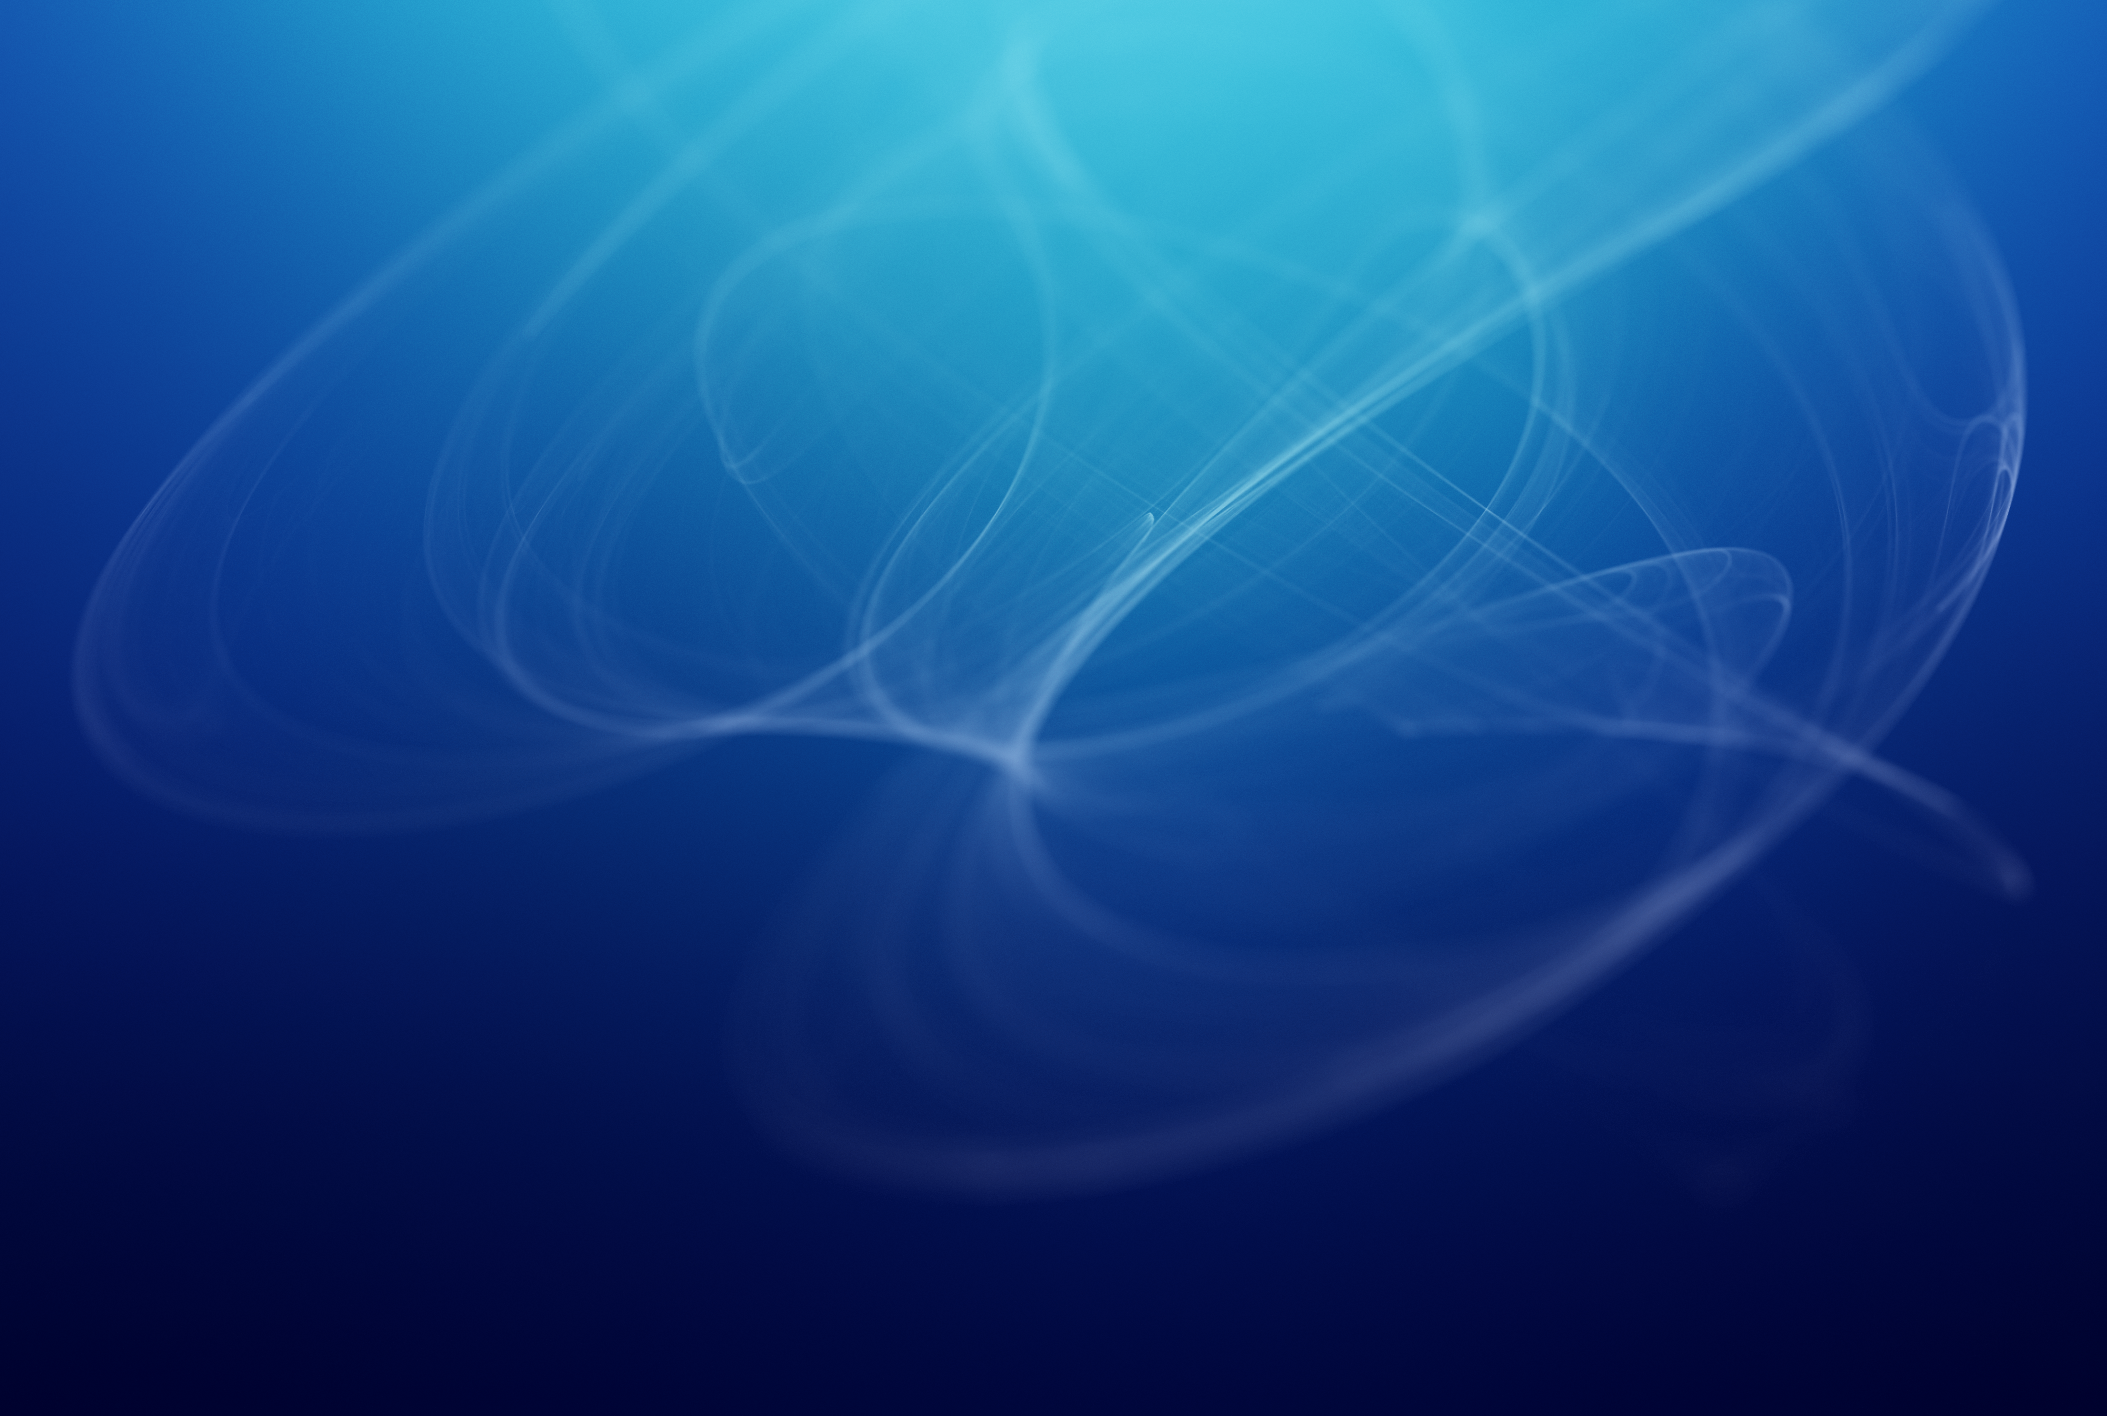 10.0/trisquel-wallpapers/data/usr/share/backgrounds/belenos4.png